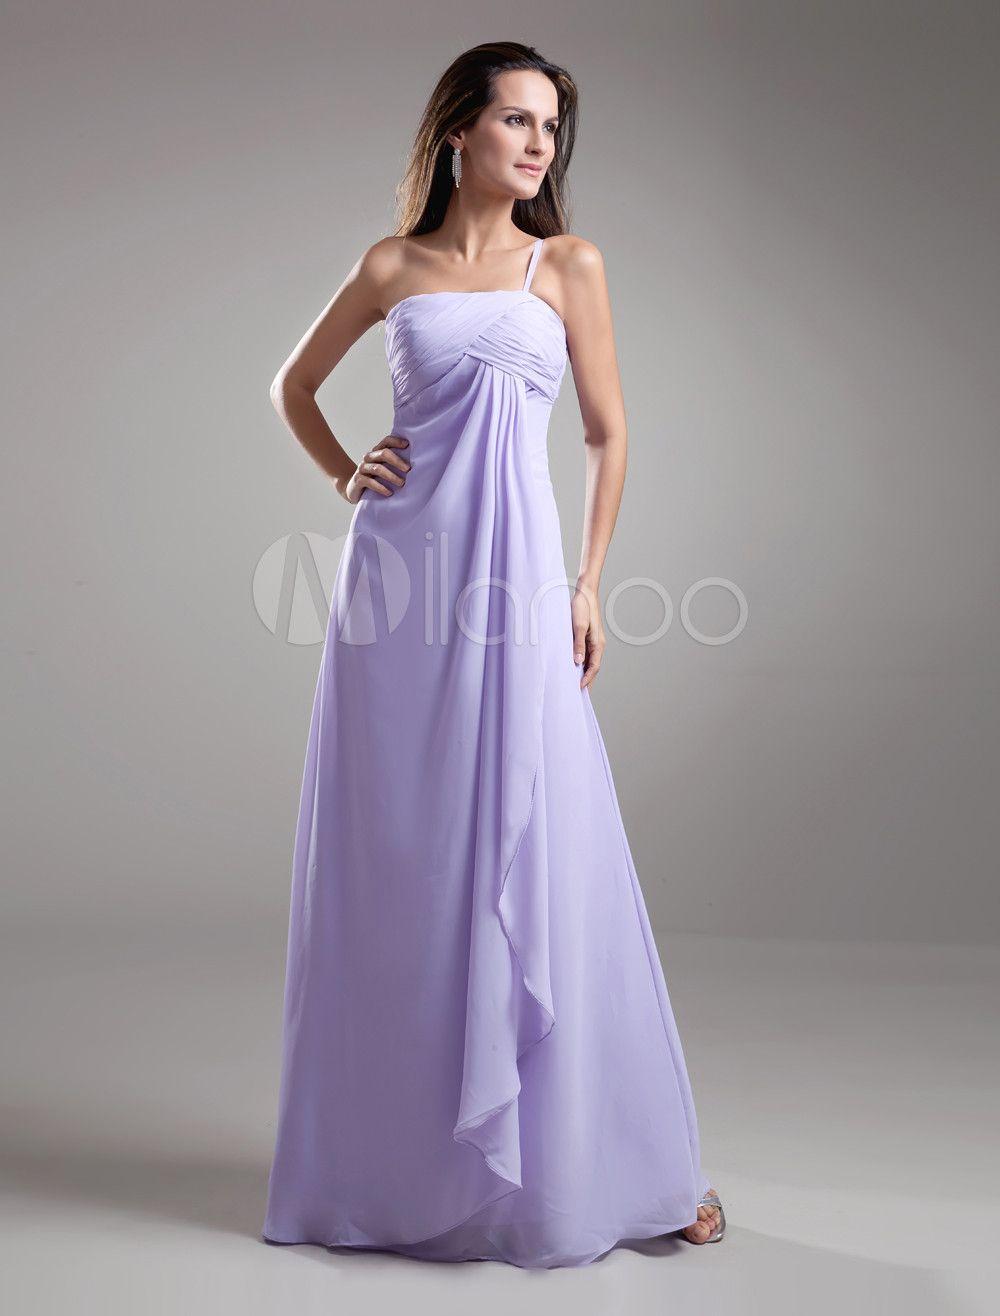 Lilac Bridesmaid Dresses Cheap Choice Image - Braidsmaid Dress ...